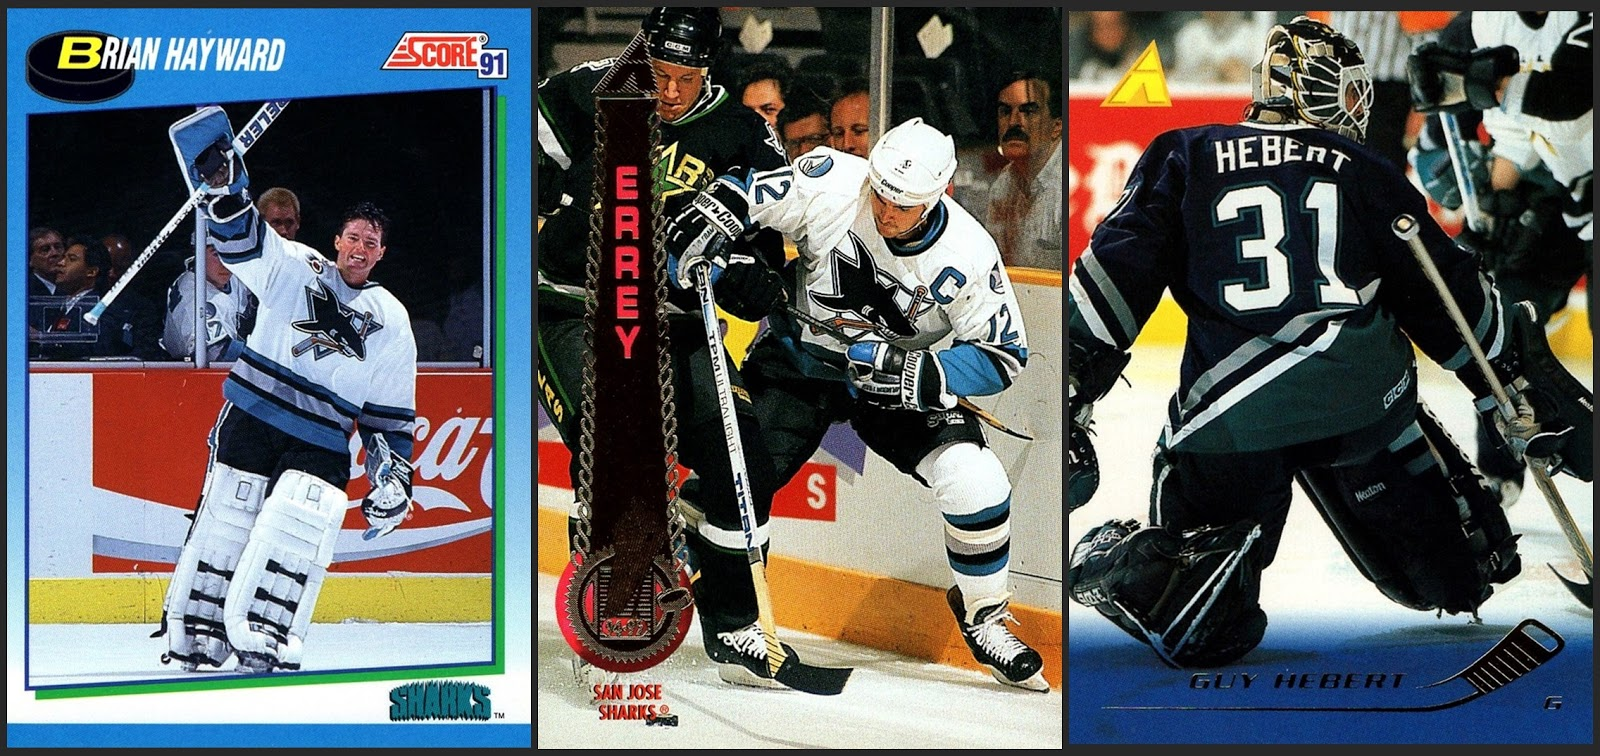 225230d583a Quebec Nordiques - 4 cards 199-91 Topps  249 1991-92 Upper Deck  367  1992-93 Pro Set  147 1992-93 Upper Deck  251